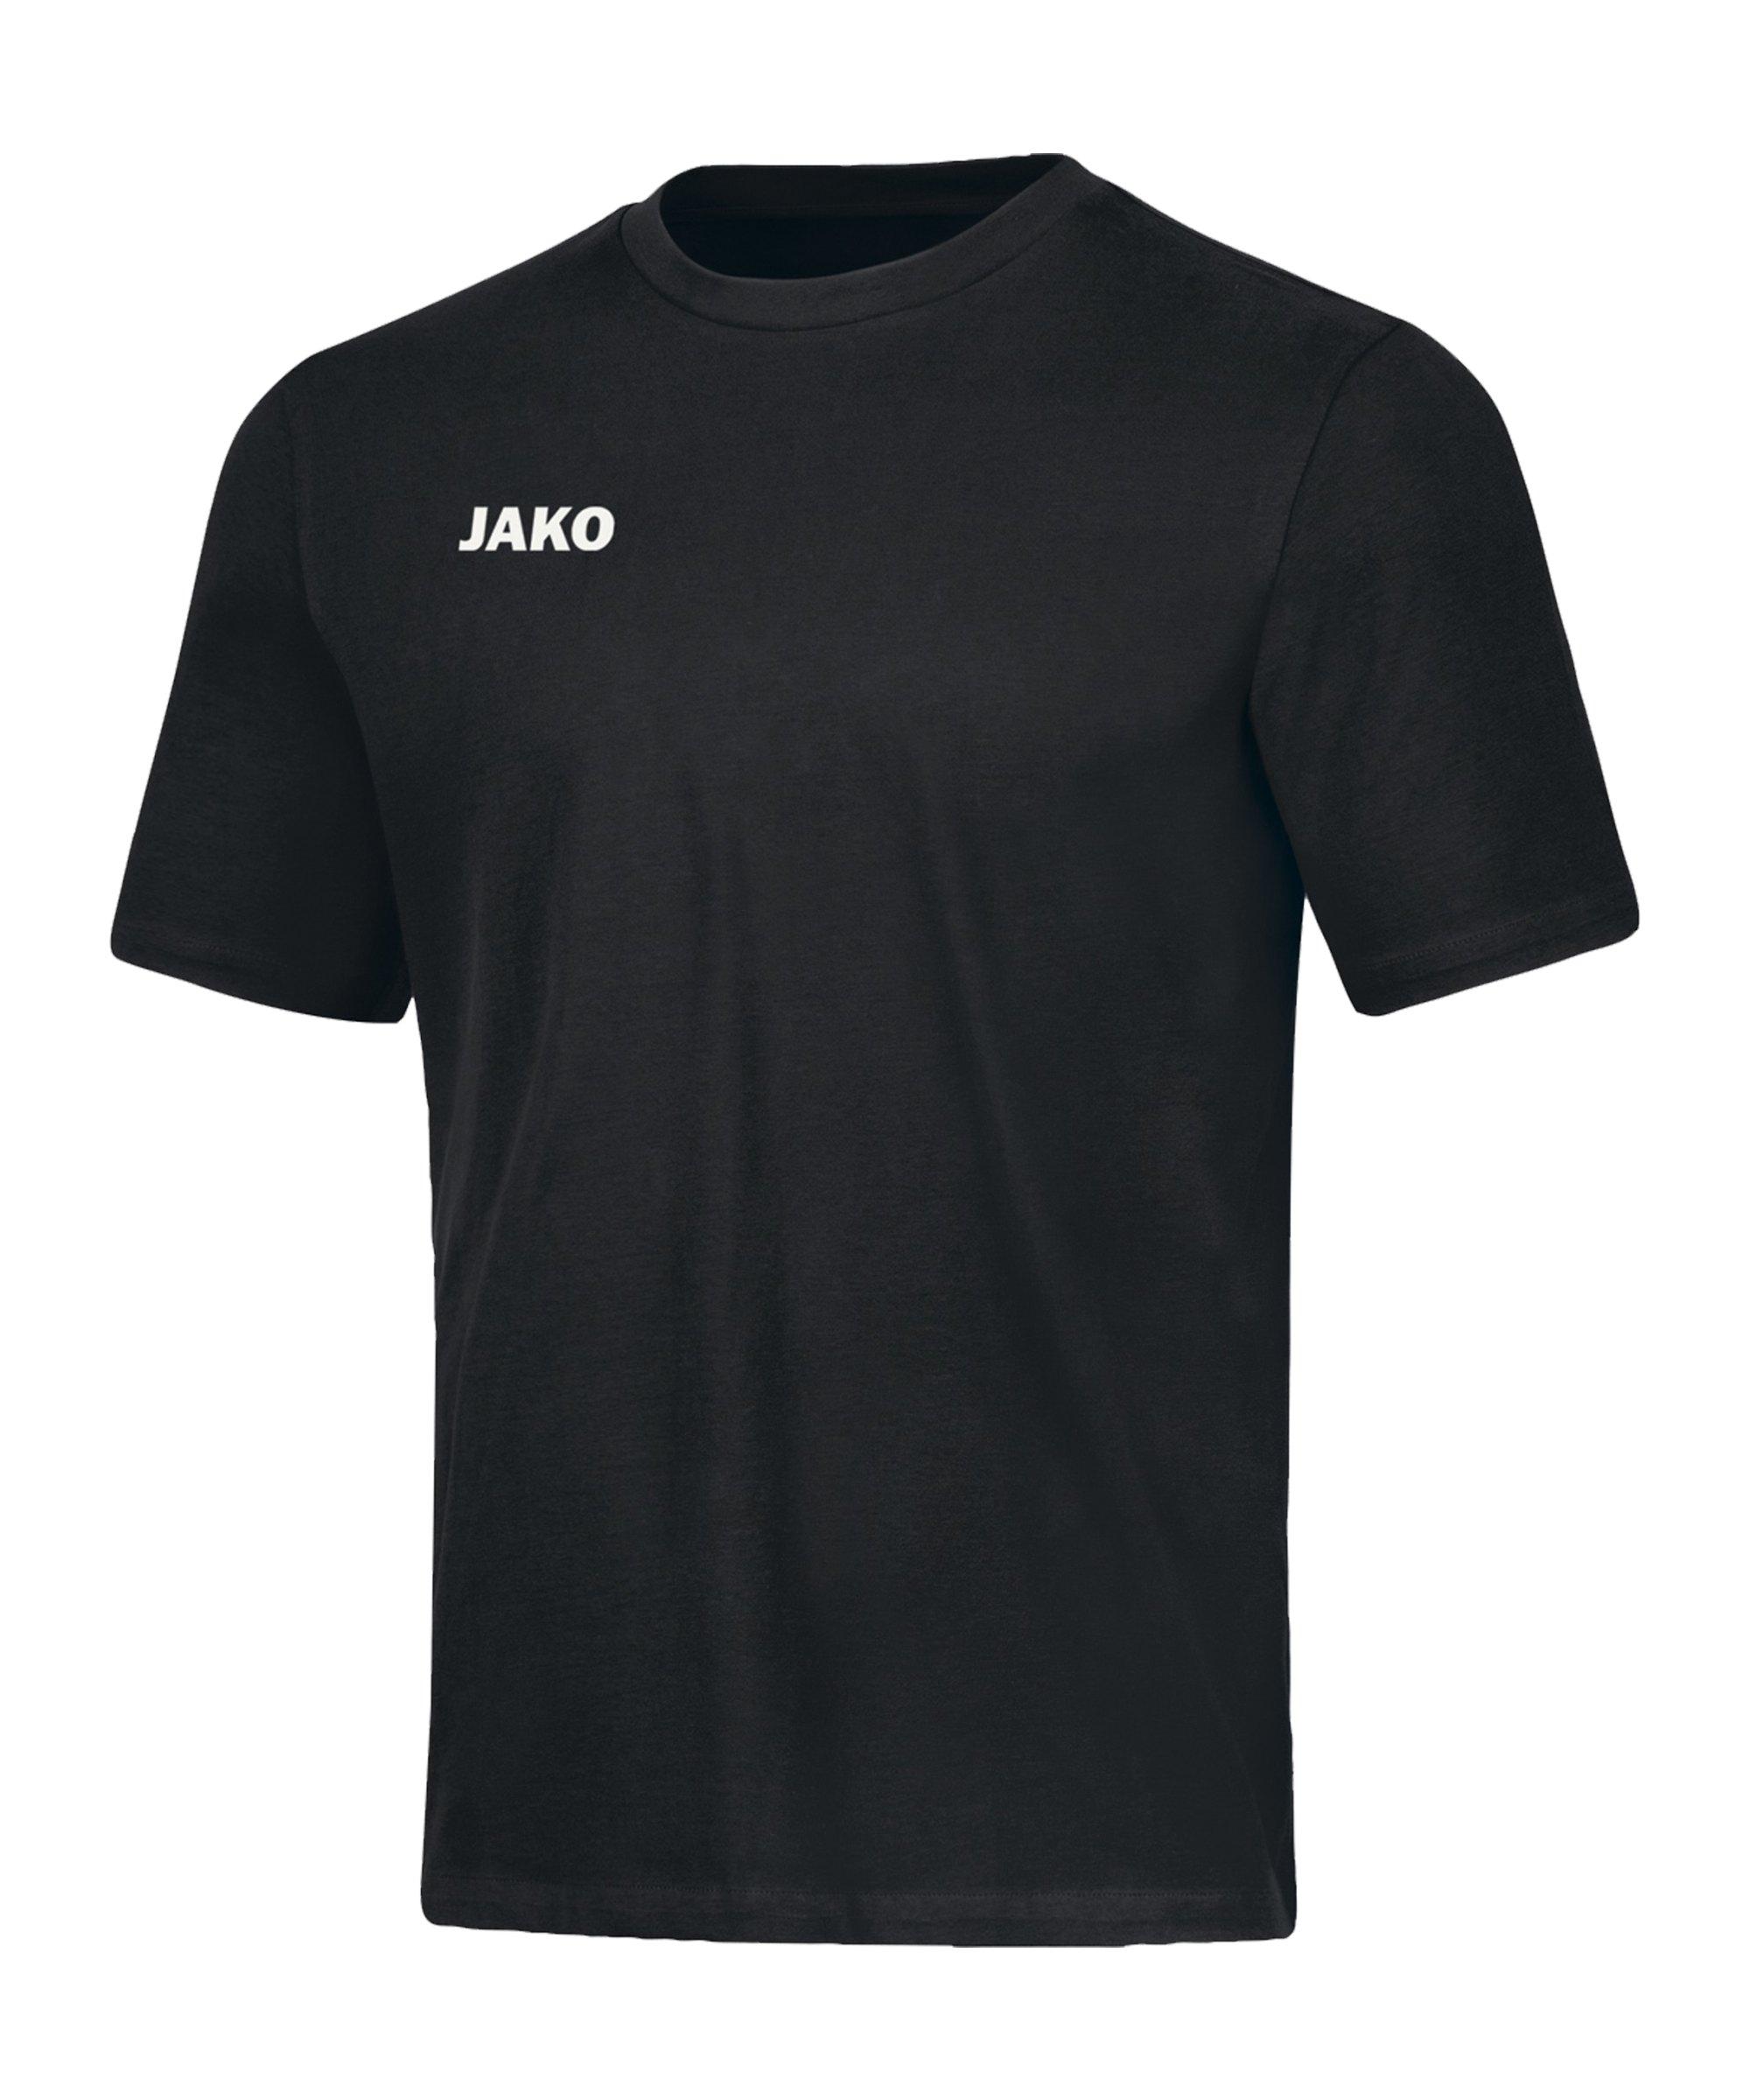 JAKO Base T-Shirt Schwarz F08 - schwarz